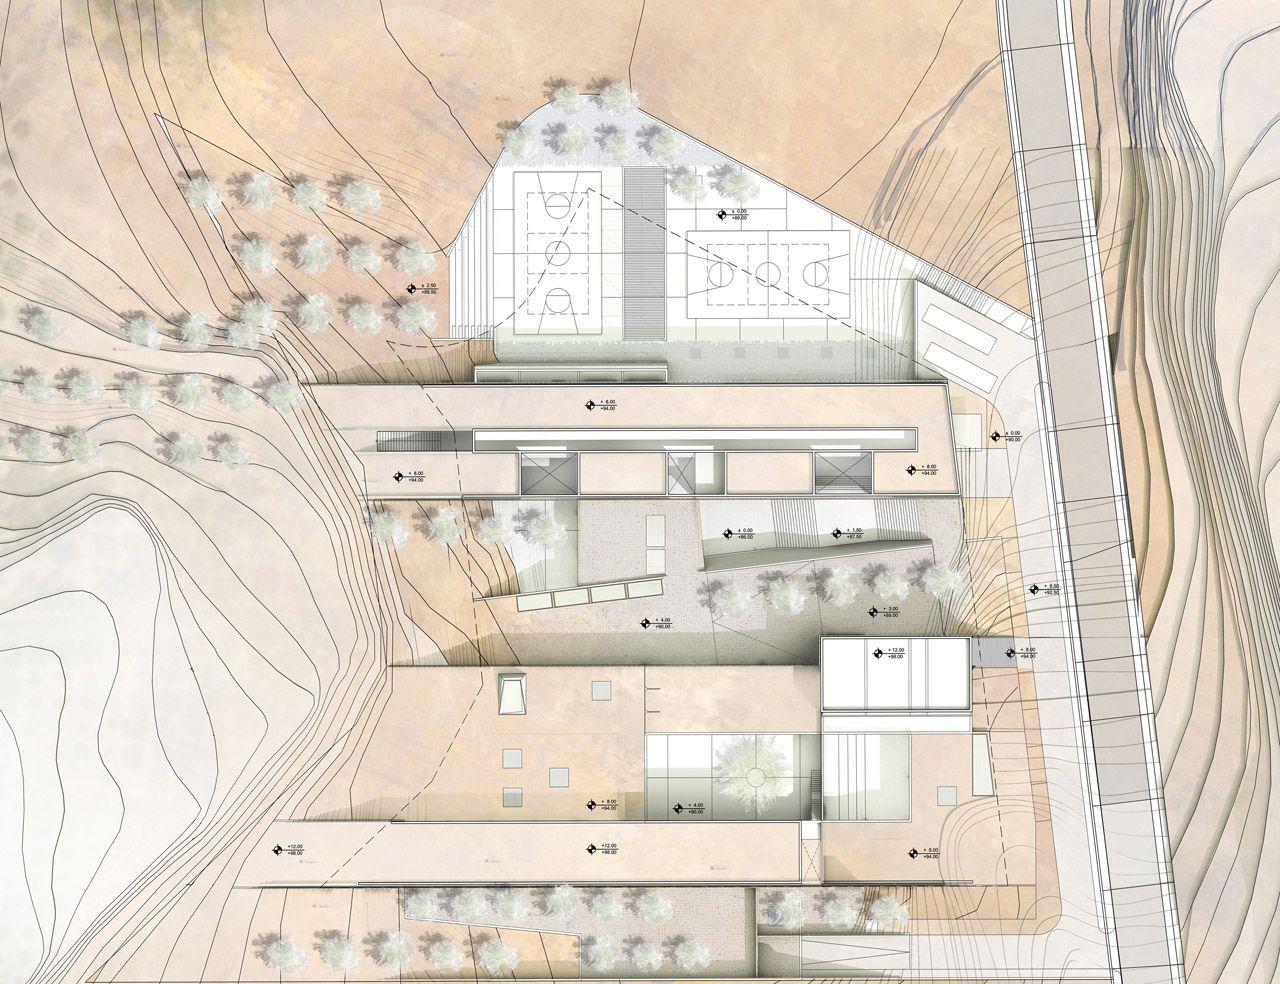 Crete Innovative Bioclimatic European School Complex